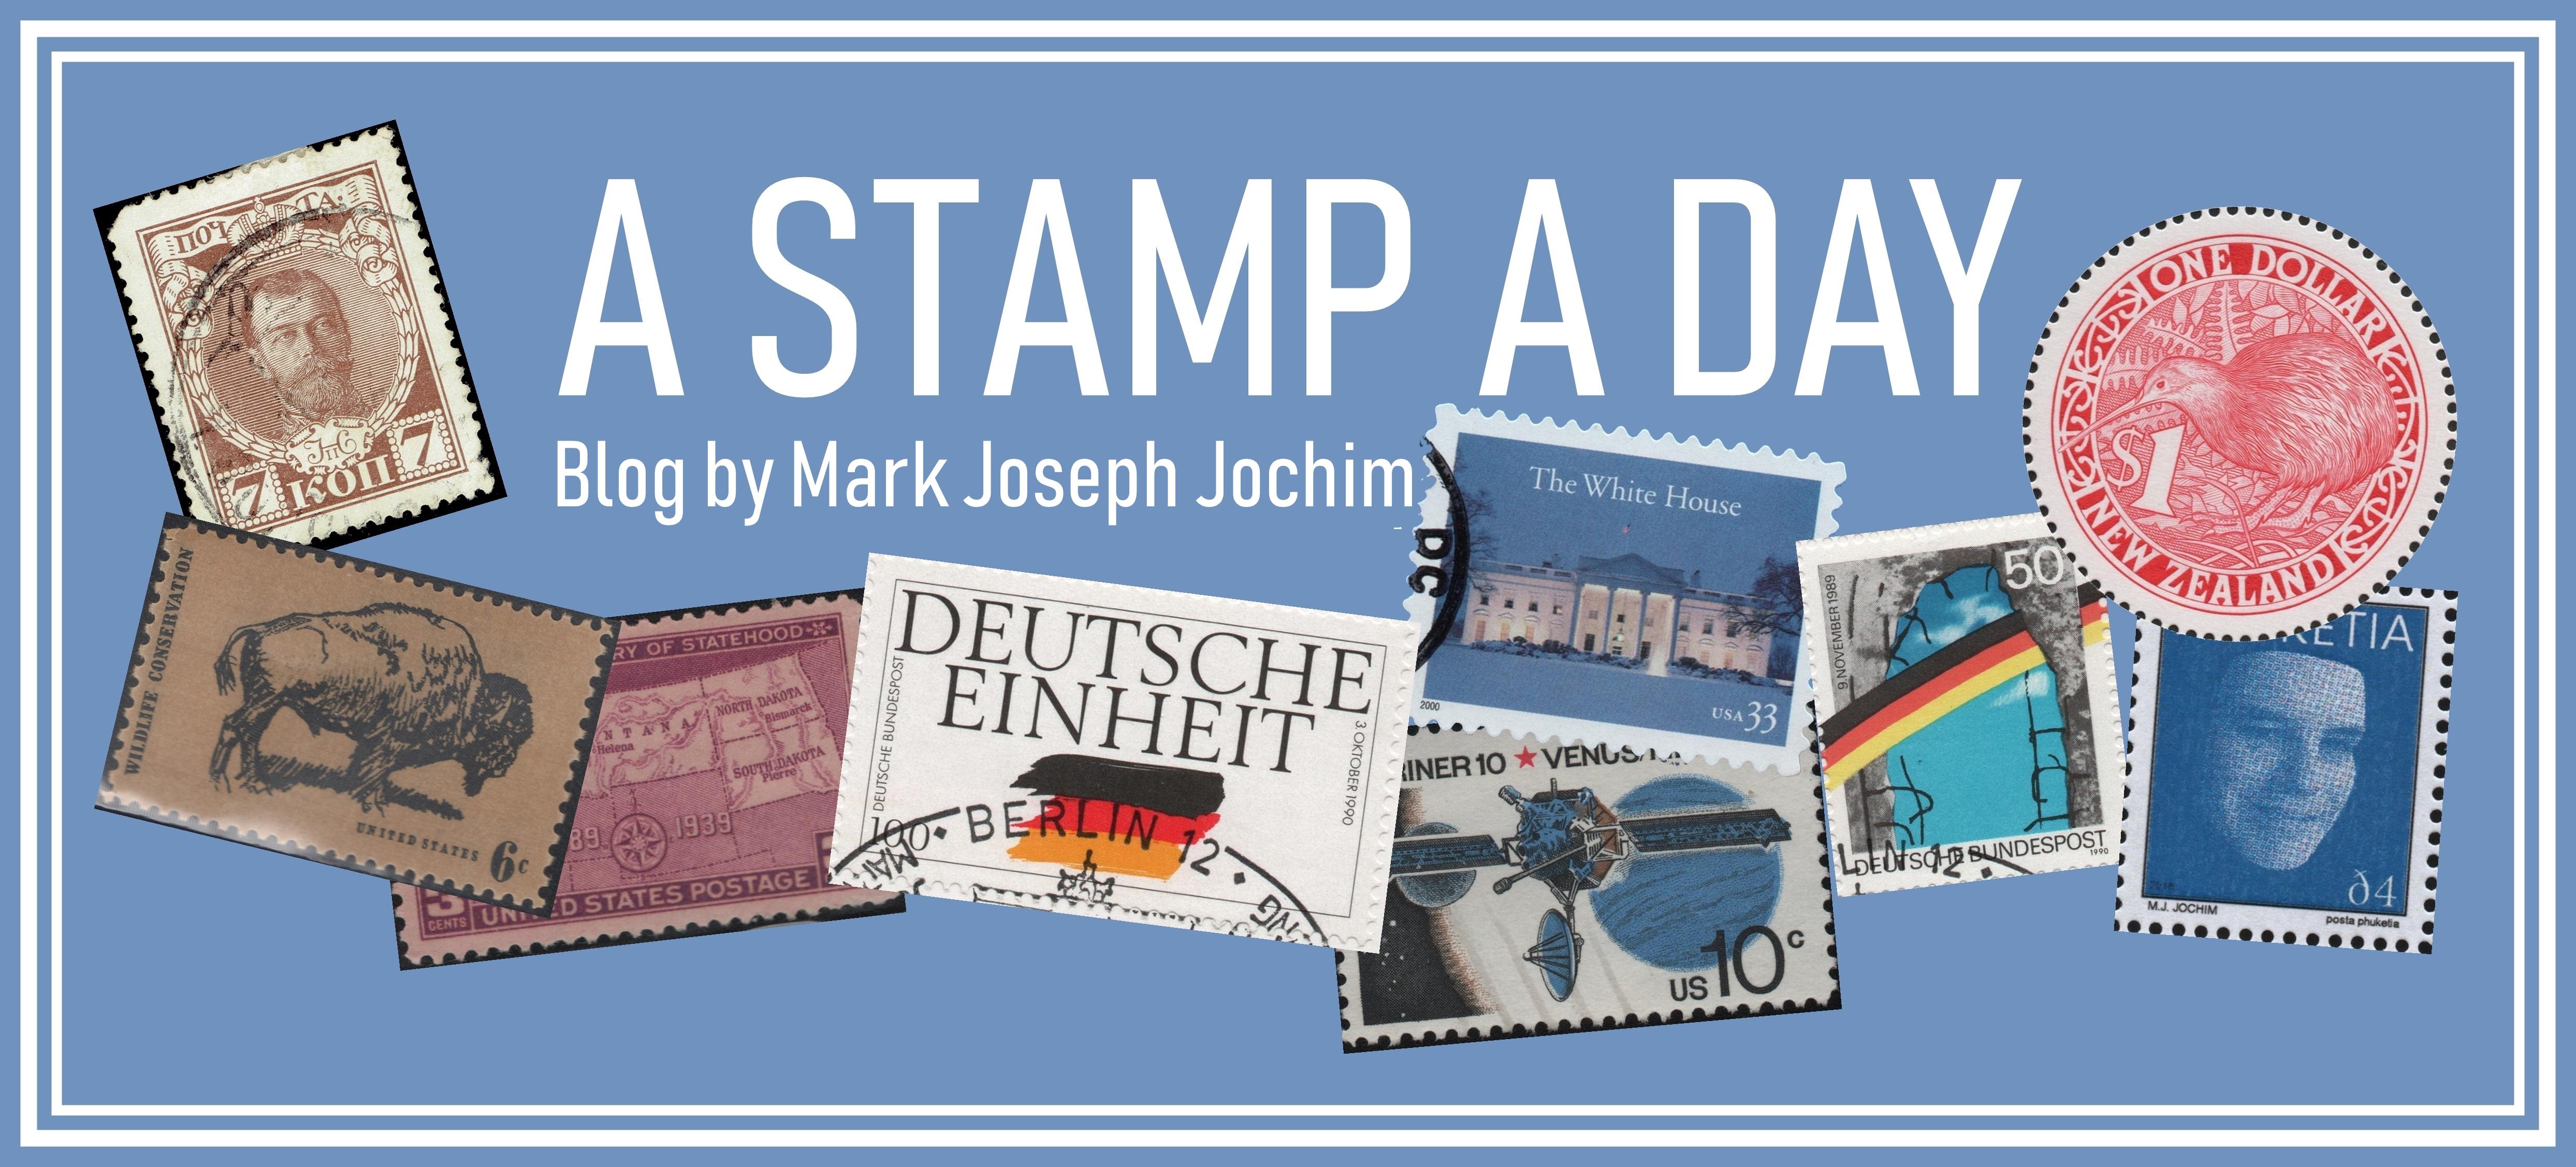 New header image for A Stamp A Day blog., November 2018.